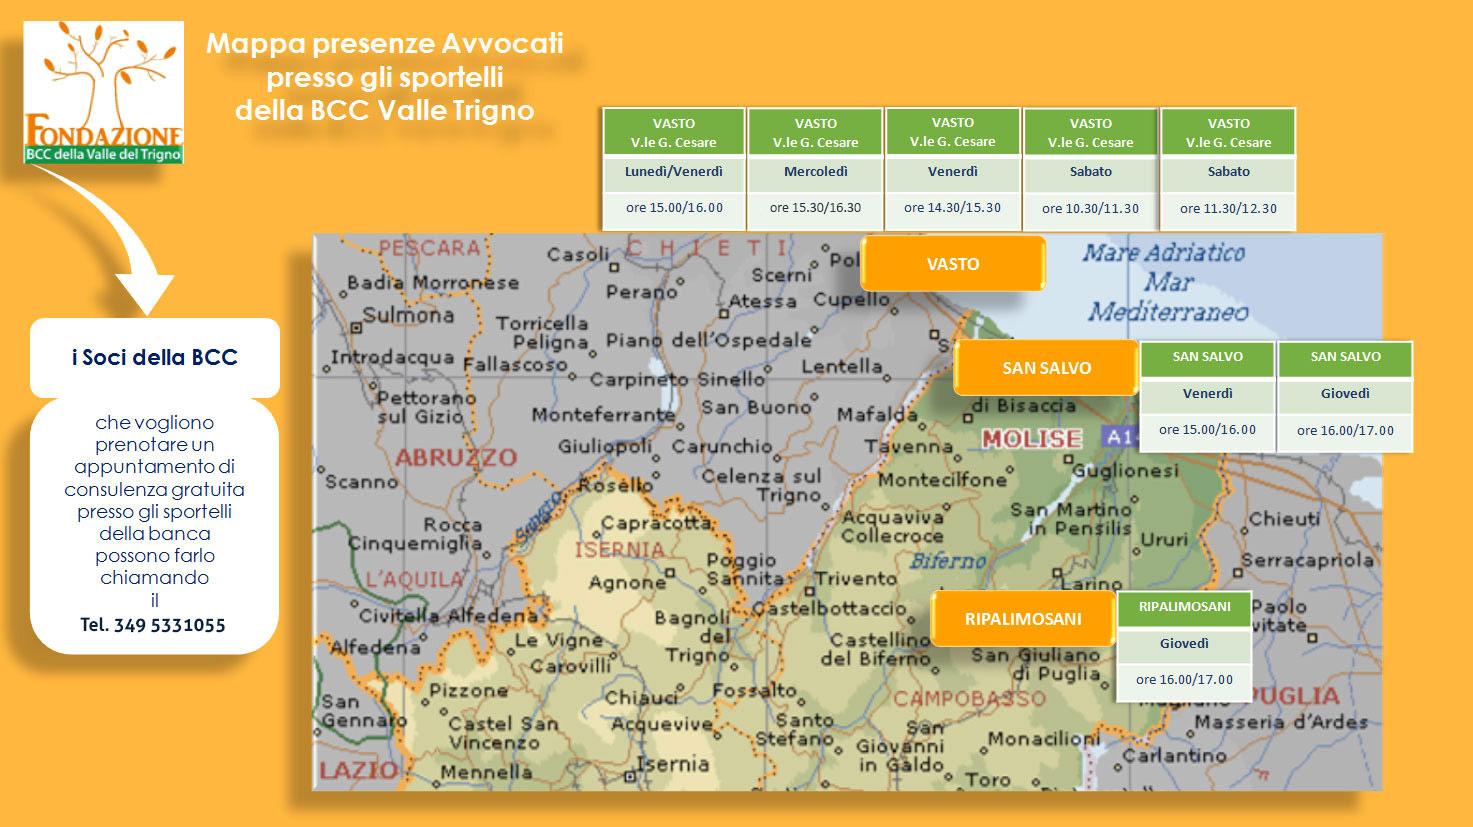 mappa-competenze-avvocati